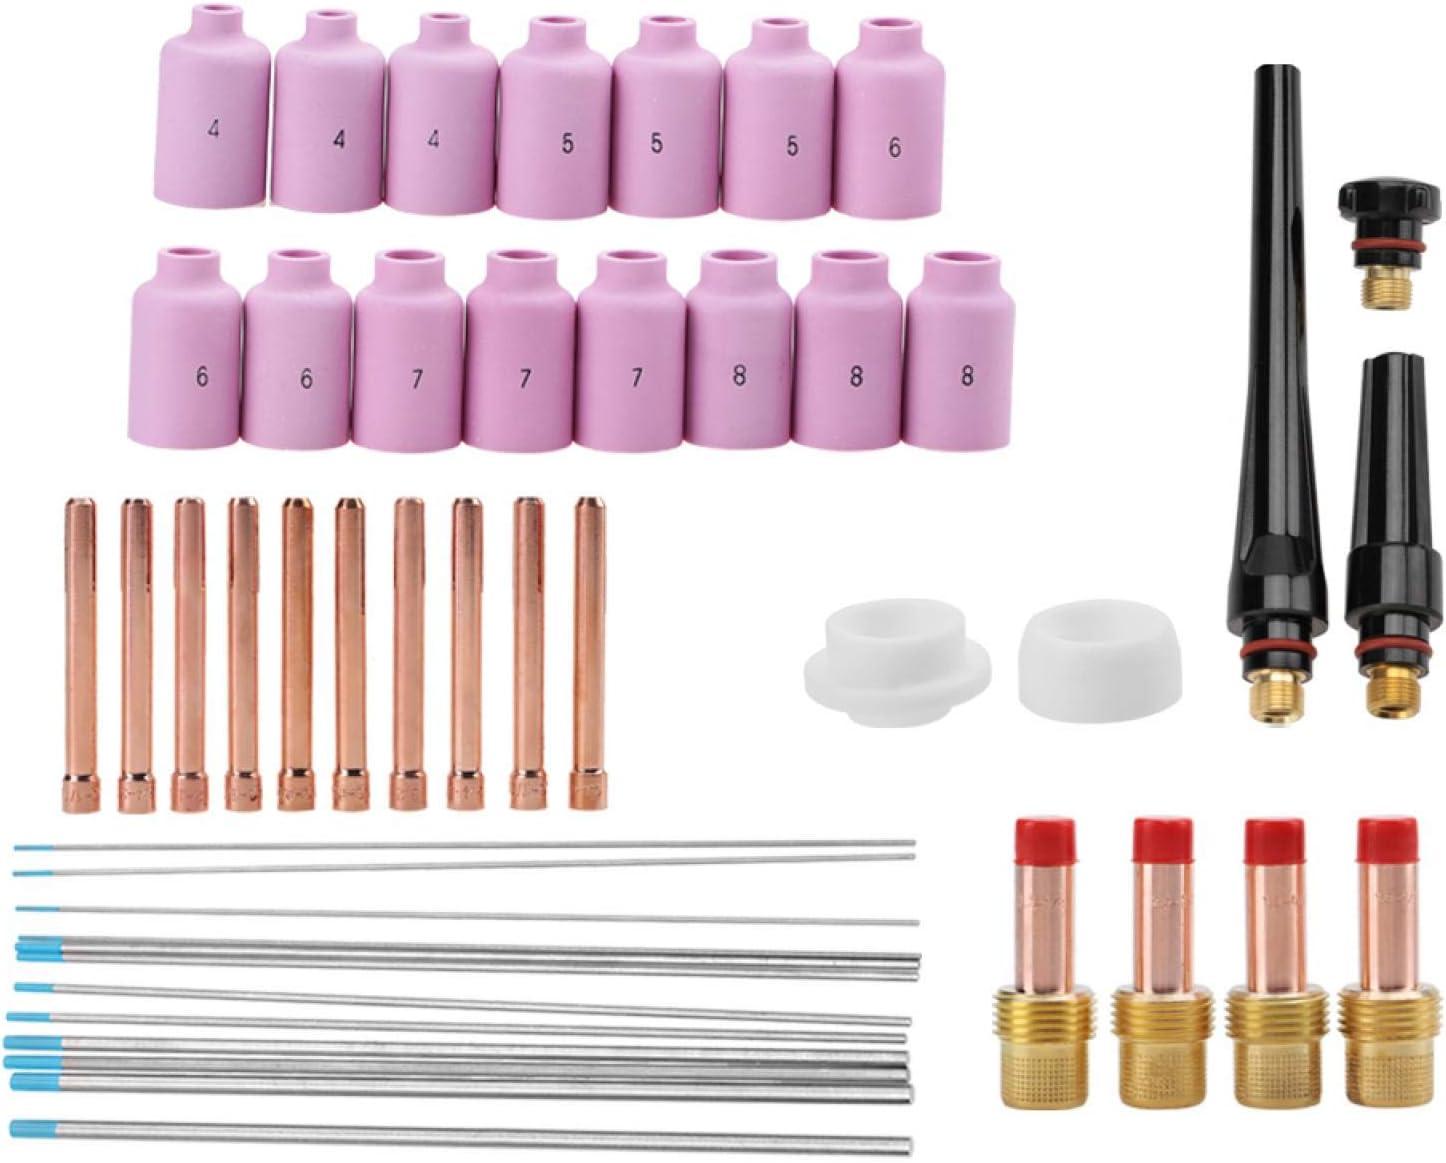 TIG Consumables Ceramic Dedication Welding Torch 46pcs for Parts 816g Max 87% OFF